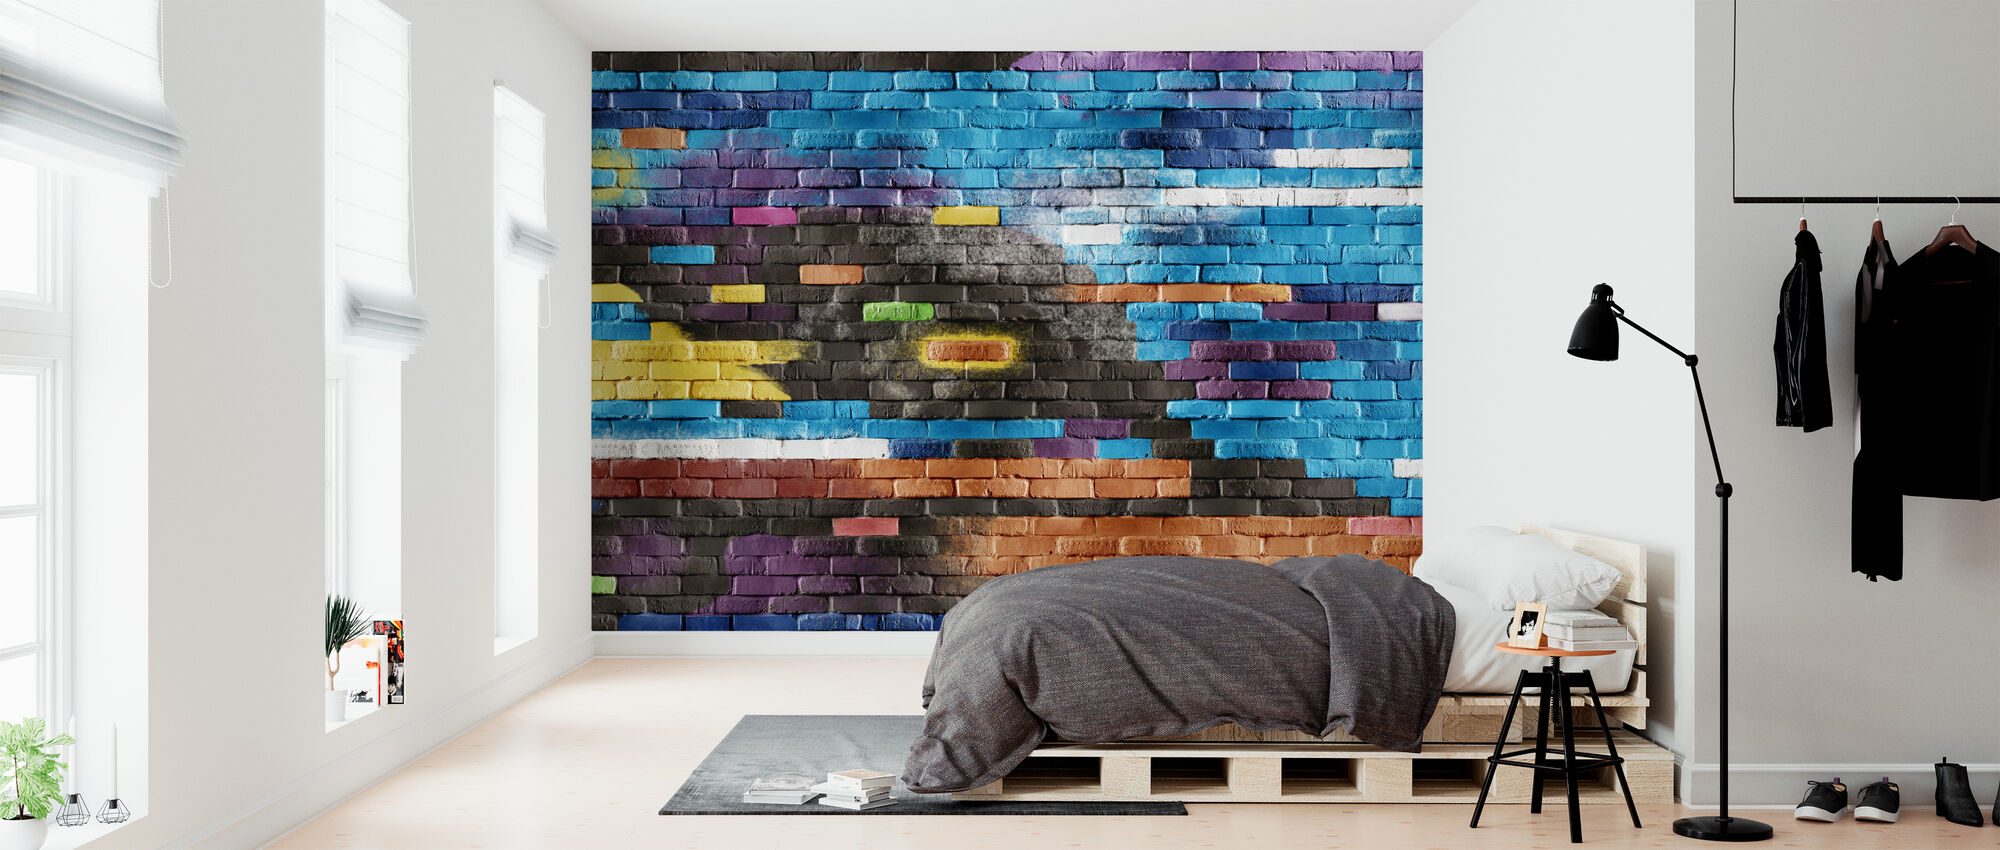 Colorful Brick Wall - Wallpaper - Bedroom